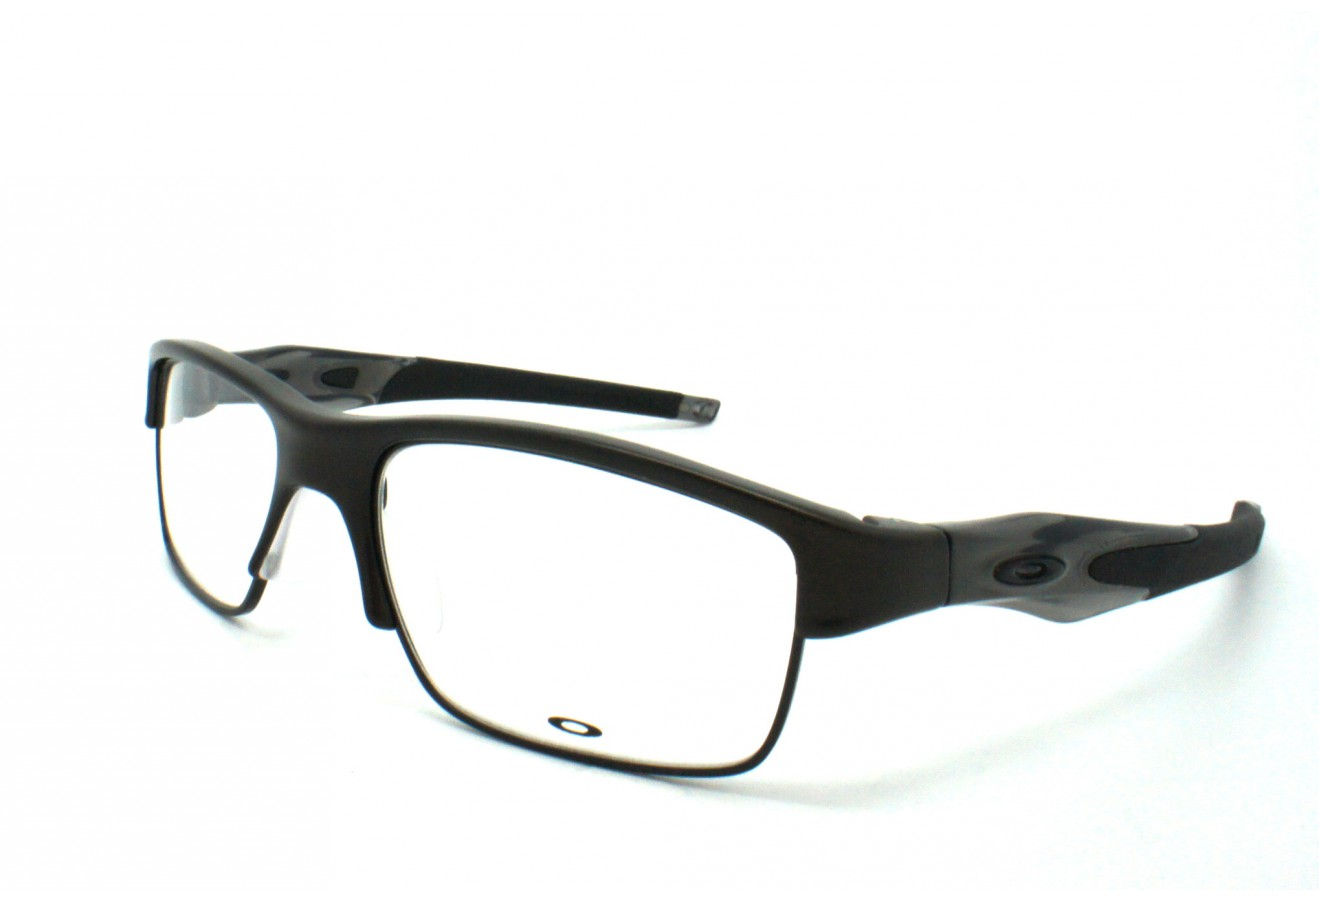 lunettes de vue oakley ox 3128 02 crosslink switch 53 18. Black Bedroom Furniture Sets. Home Design Ideas